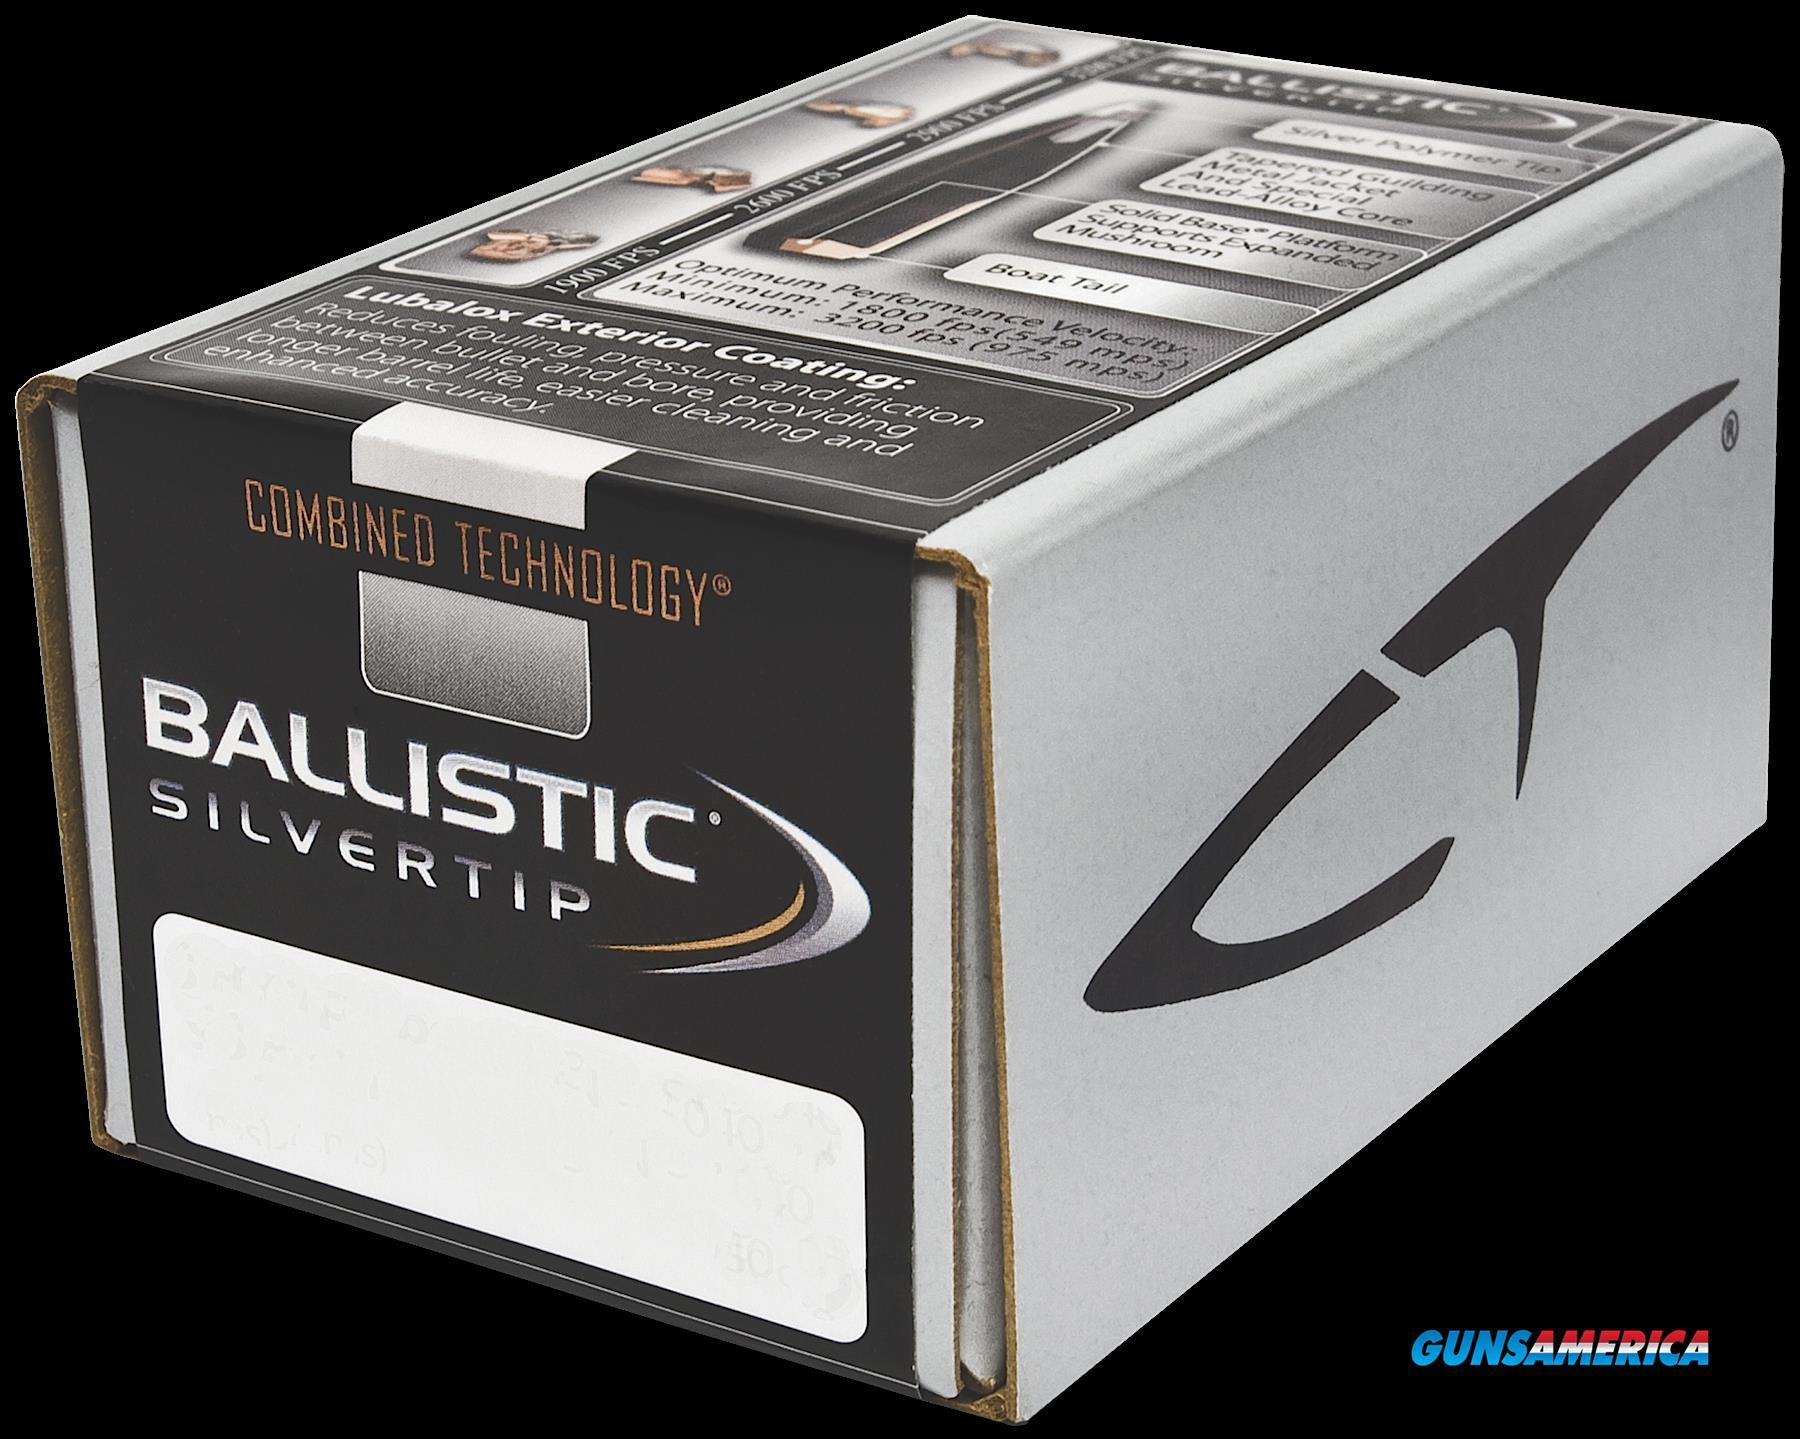 Nosler Ballistic Silvertip, Nos 51110 Blstc St    7mm 150 Bt    50  Guns > Pistols > 1911 Pistol Copies (non-Colt)